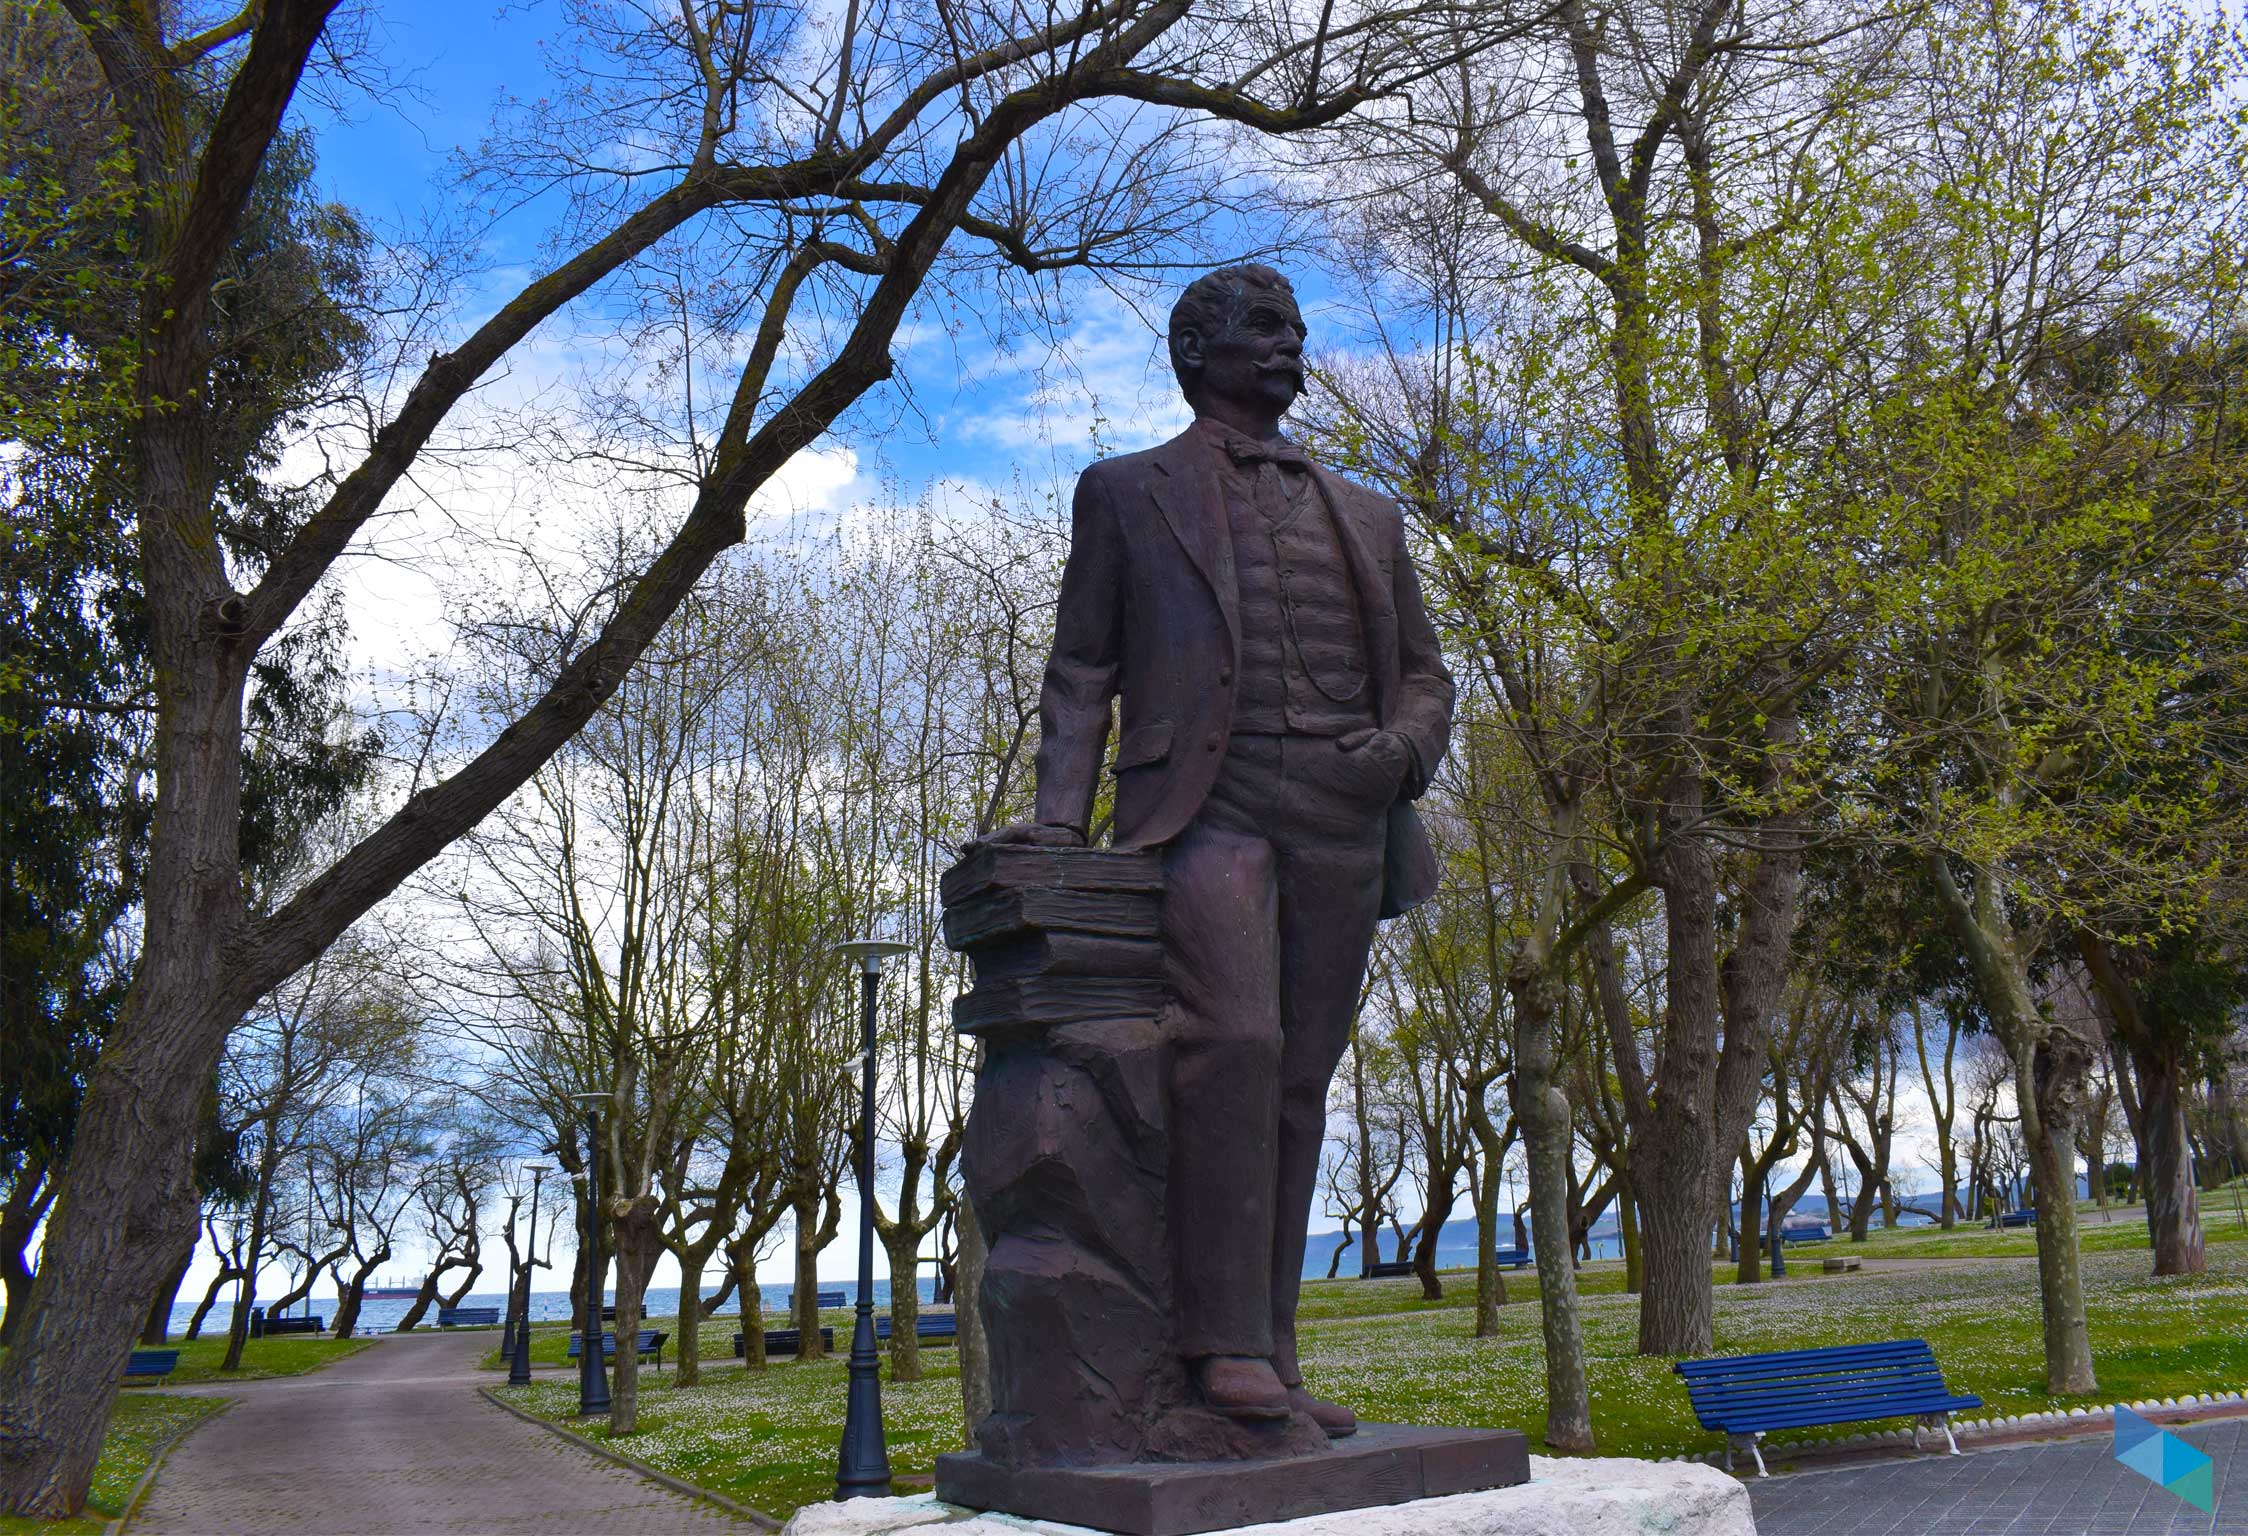 Parque de Mesones escultura alcalde